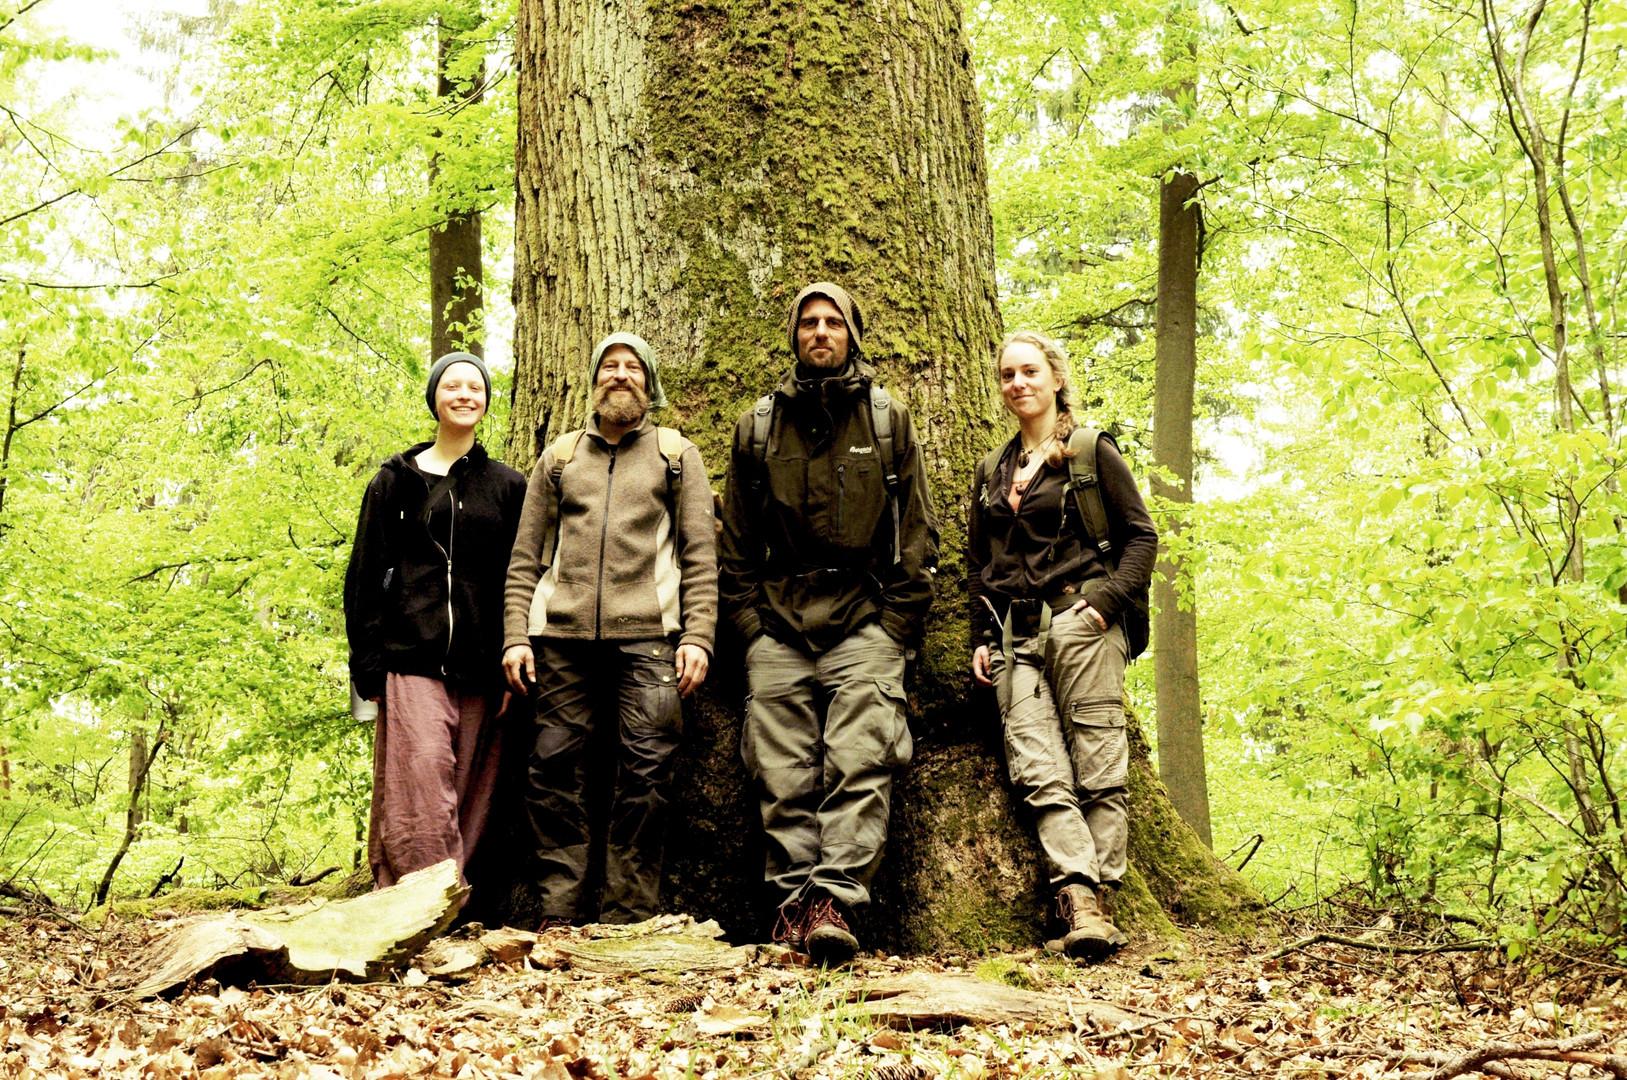 Waldläufer_0001.jpg